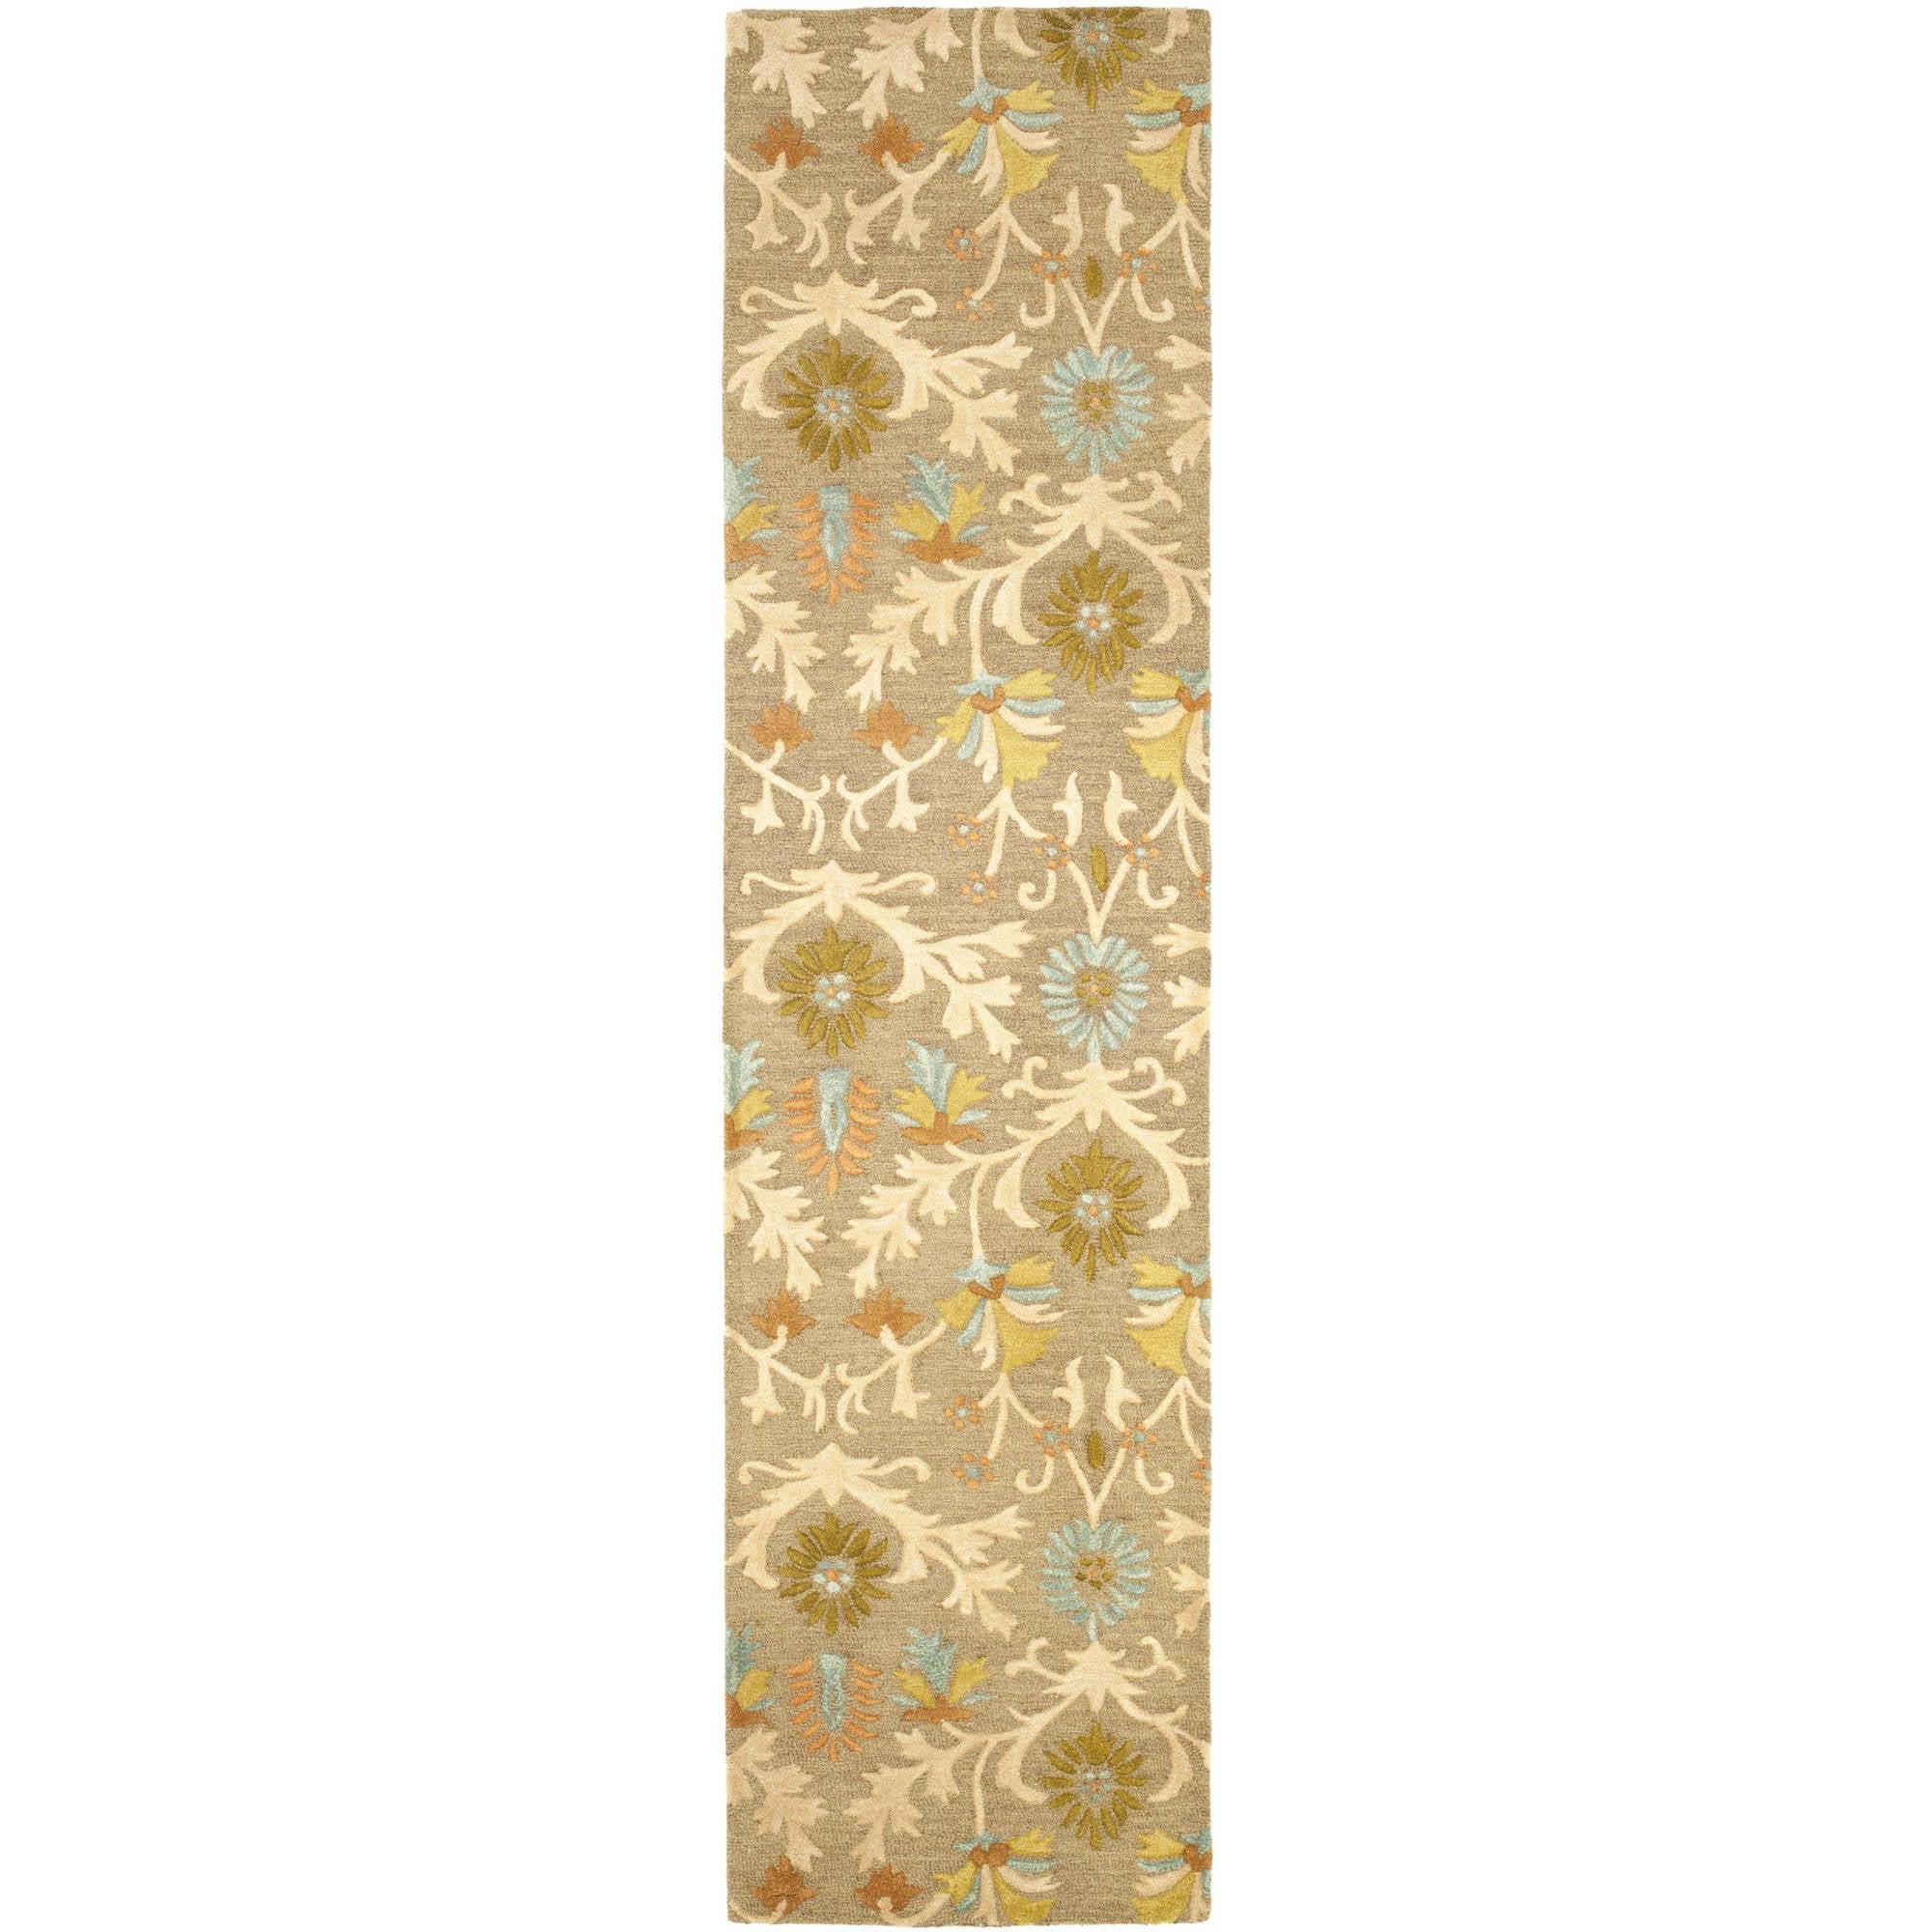 Safavieh Cambridge Jone Welsh Wool Pile Runner Rug, Moss/Multi